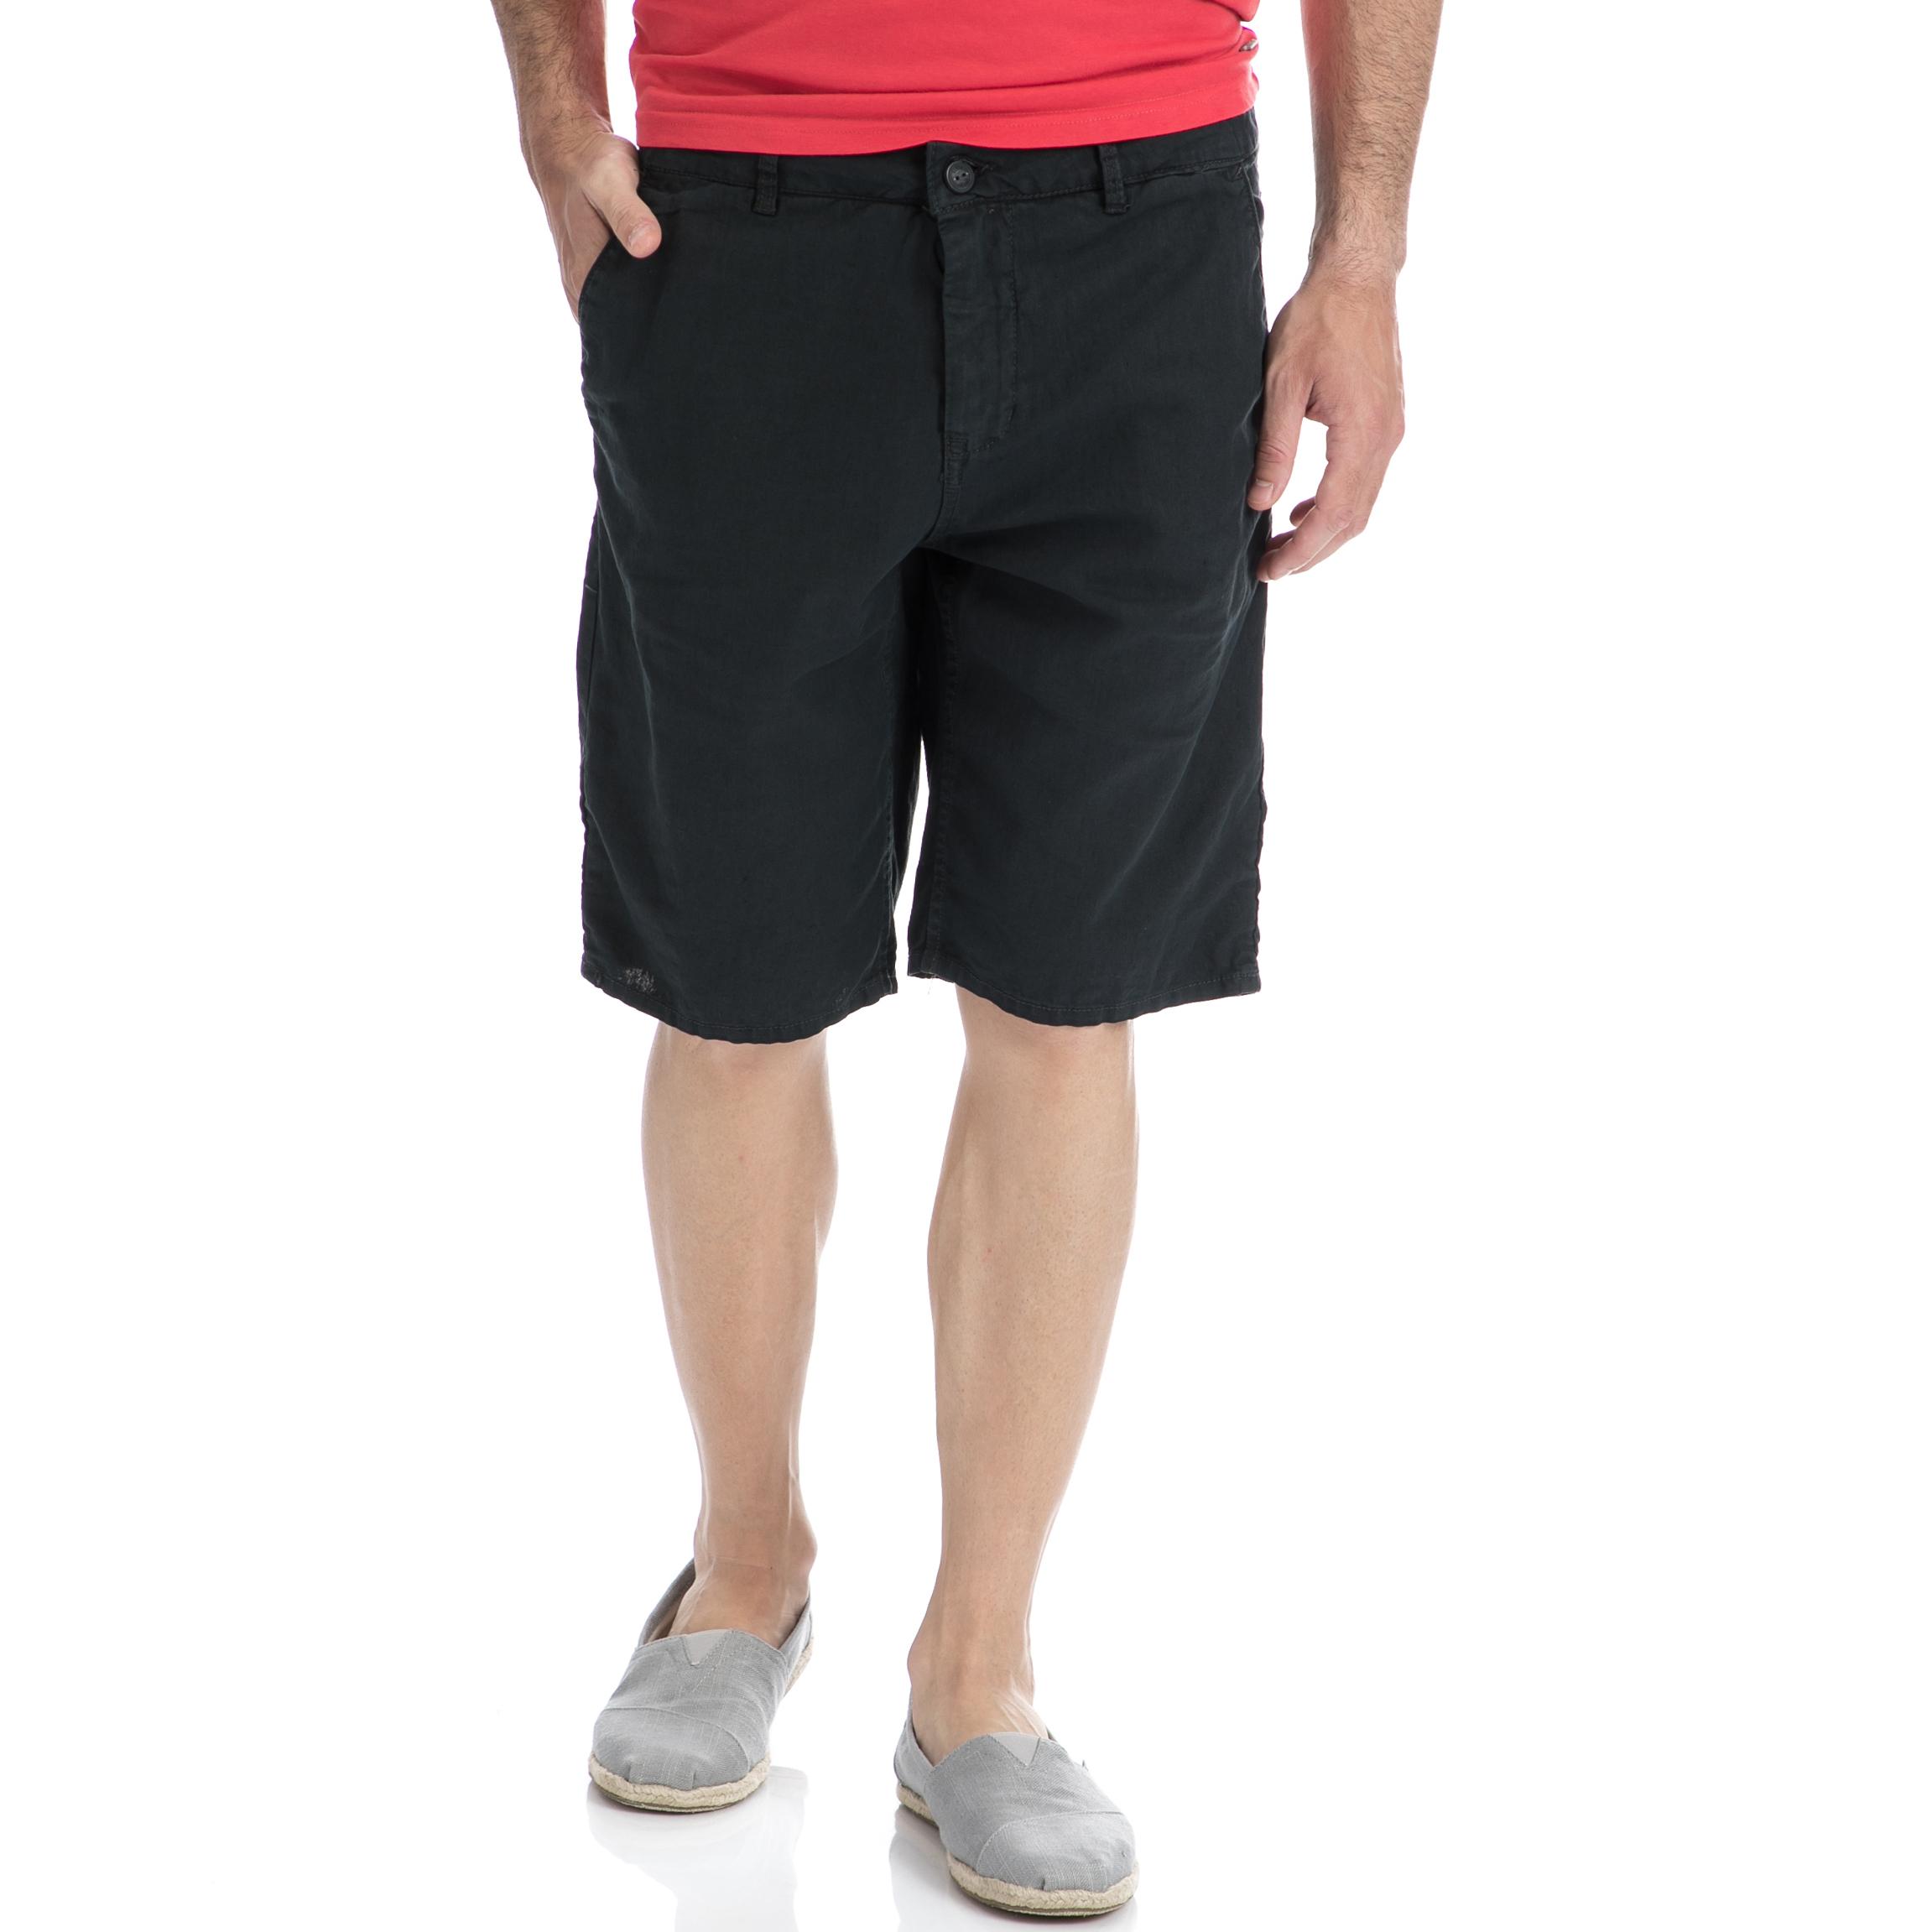 GARCIA JEANS - Αντρική βερμούδα Garcia Jeans μαύρη-γκρι ανδρικά ρούχα σορτς βερμούδες casual jean